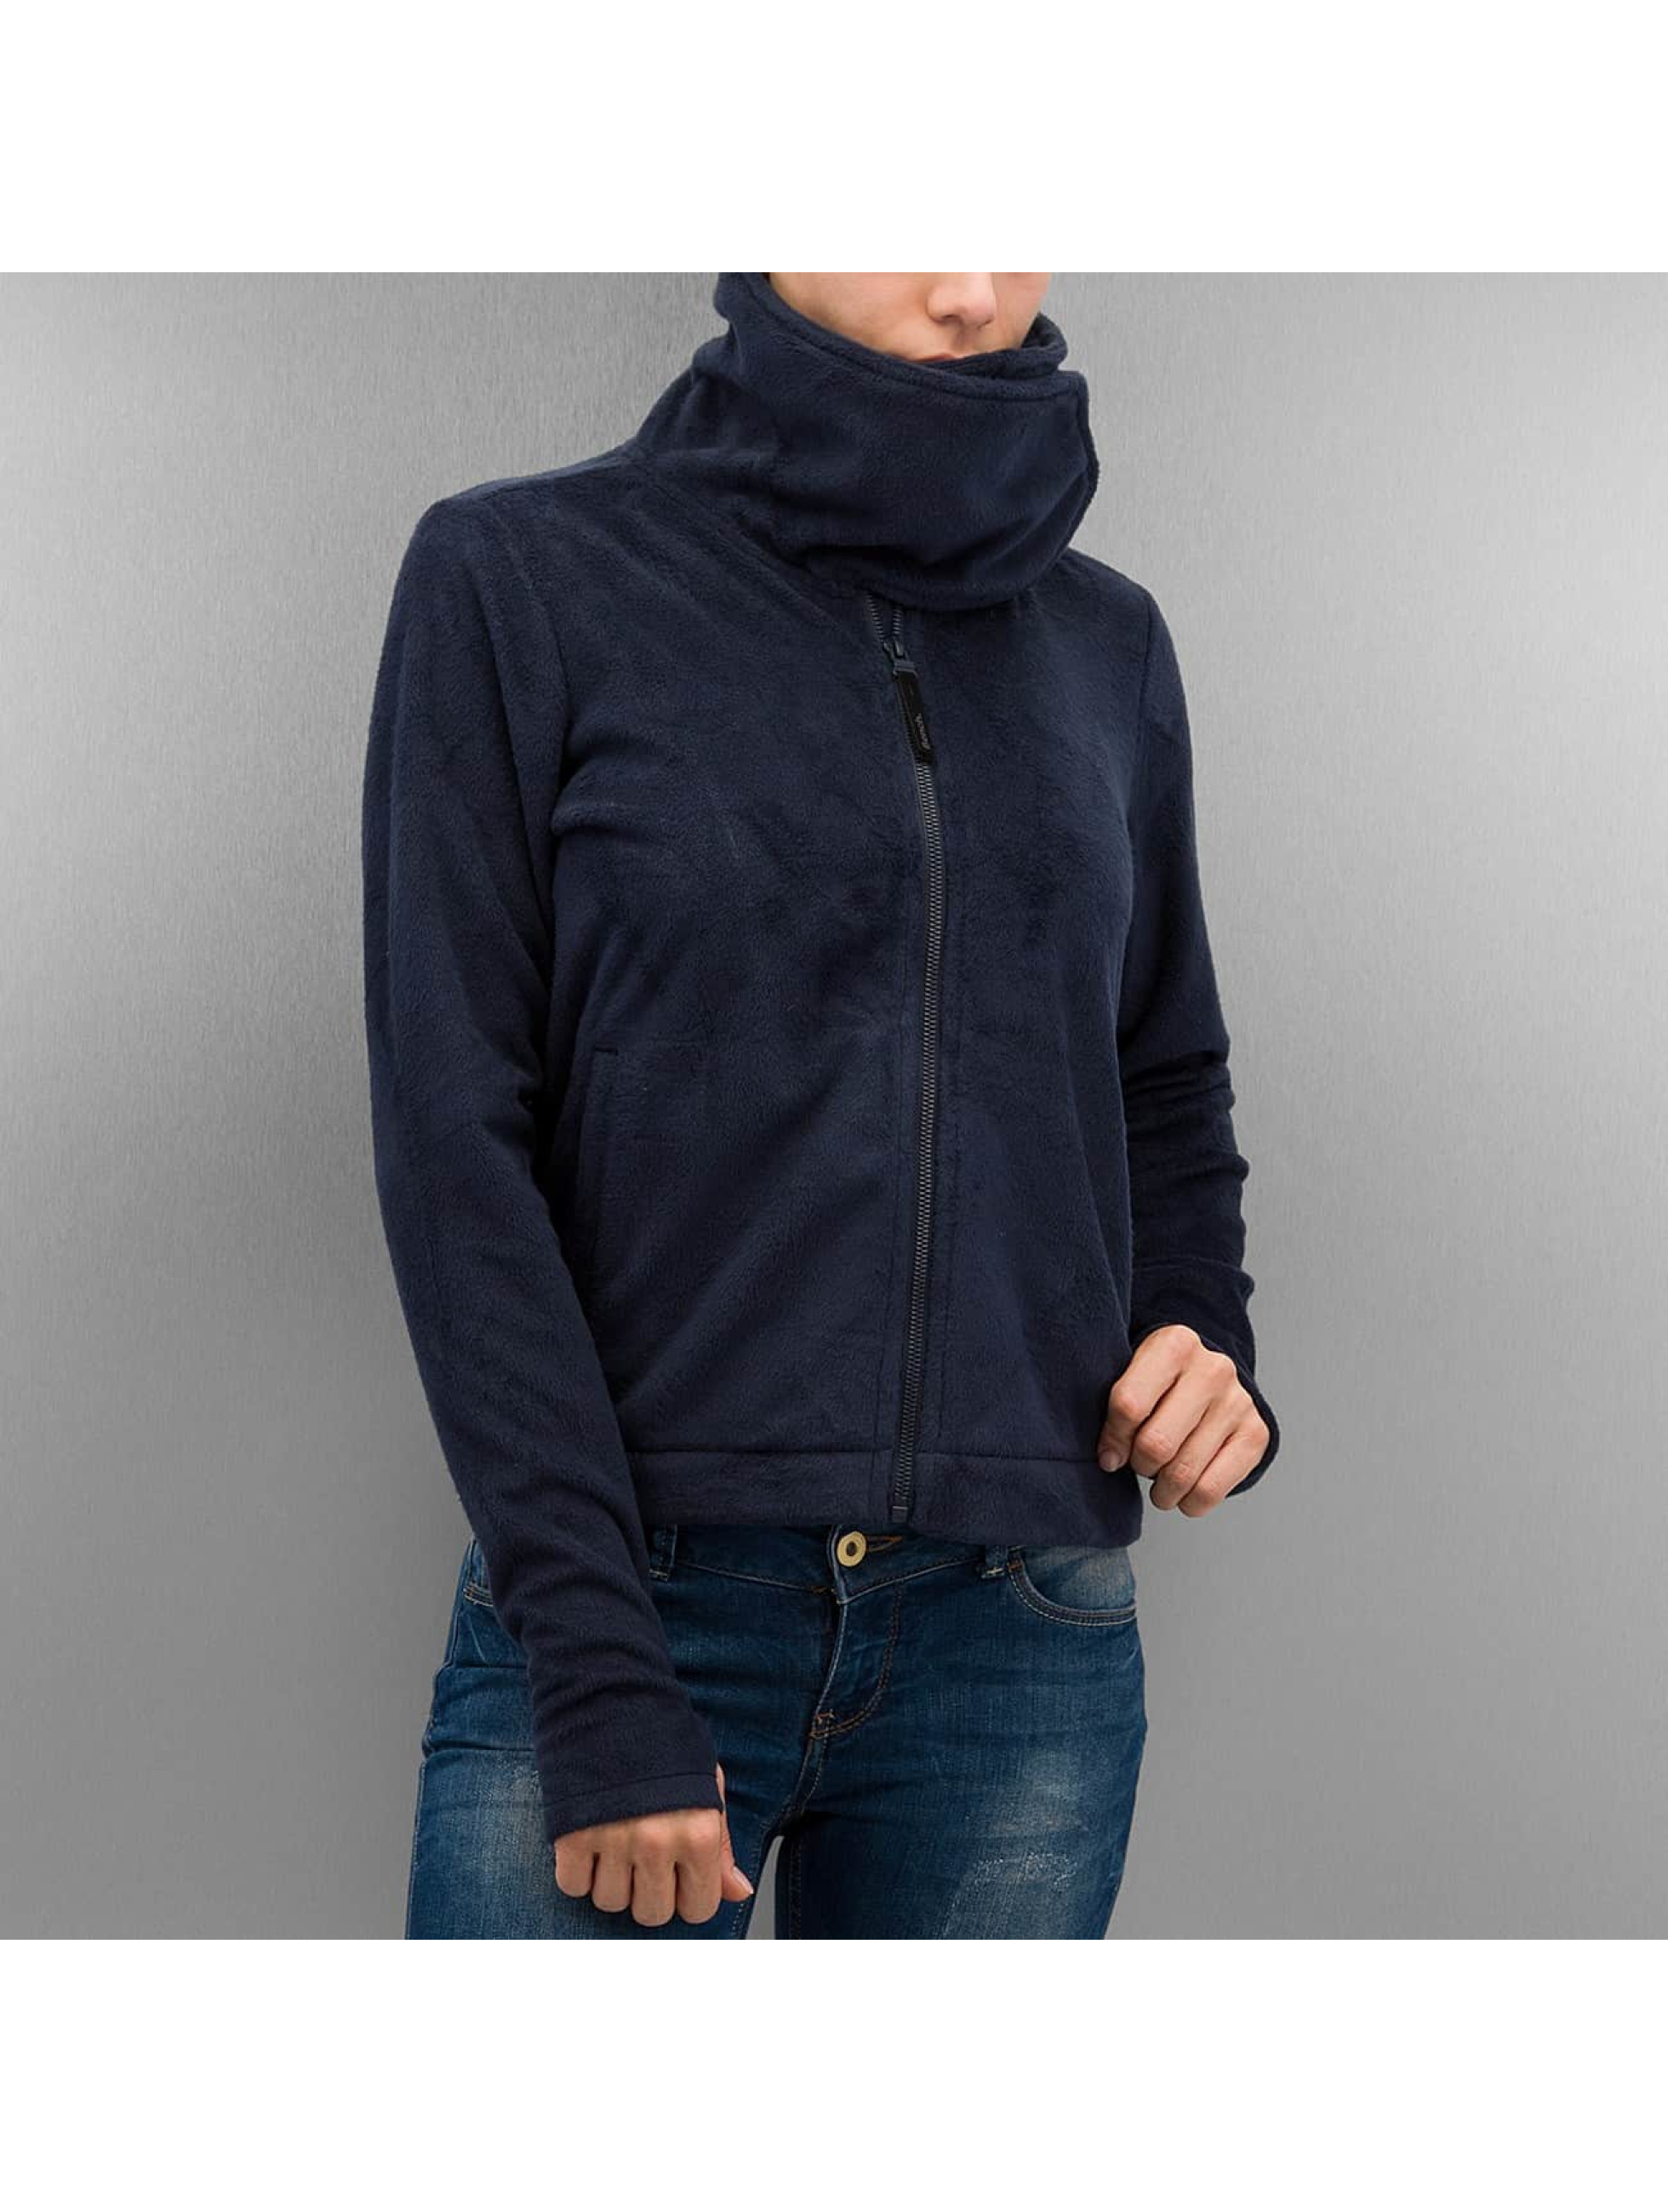 Bench Демисезонная куртка Difference Fleece Jacket синий